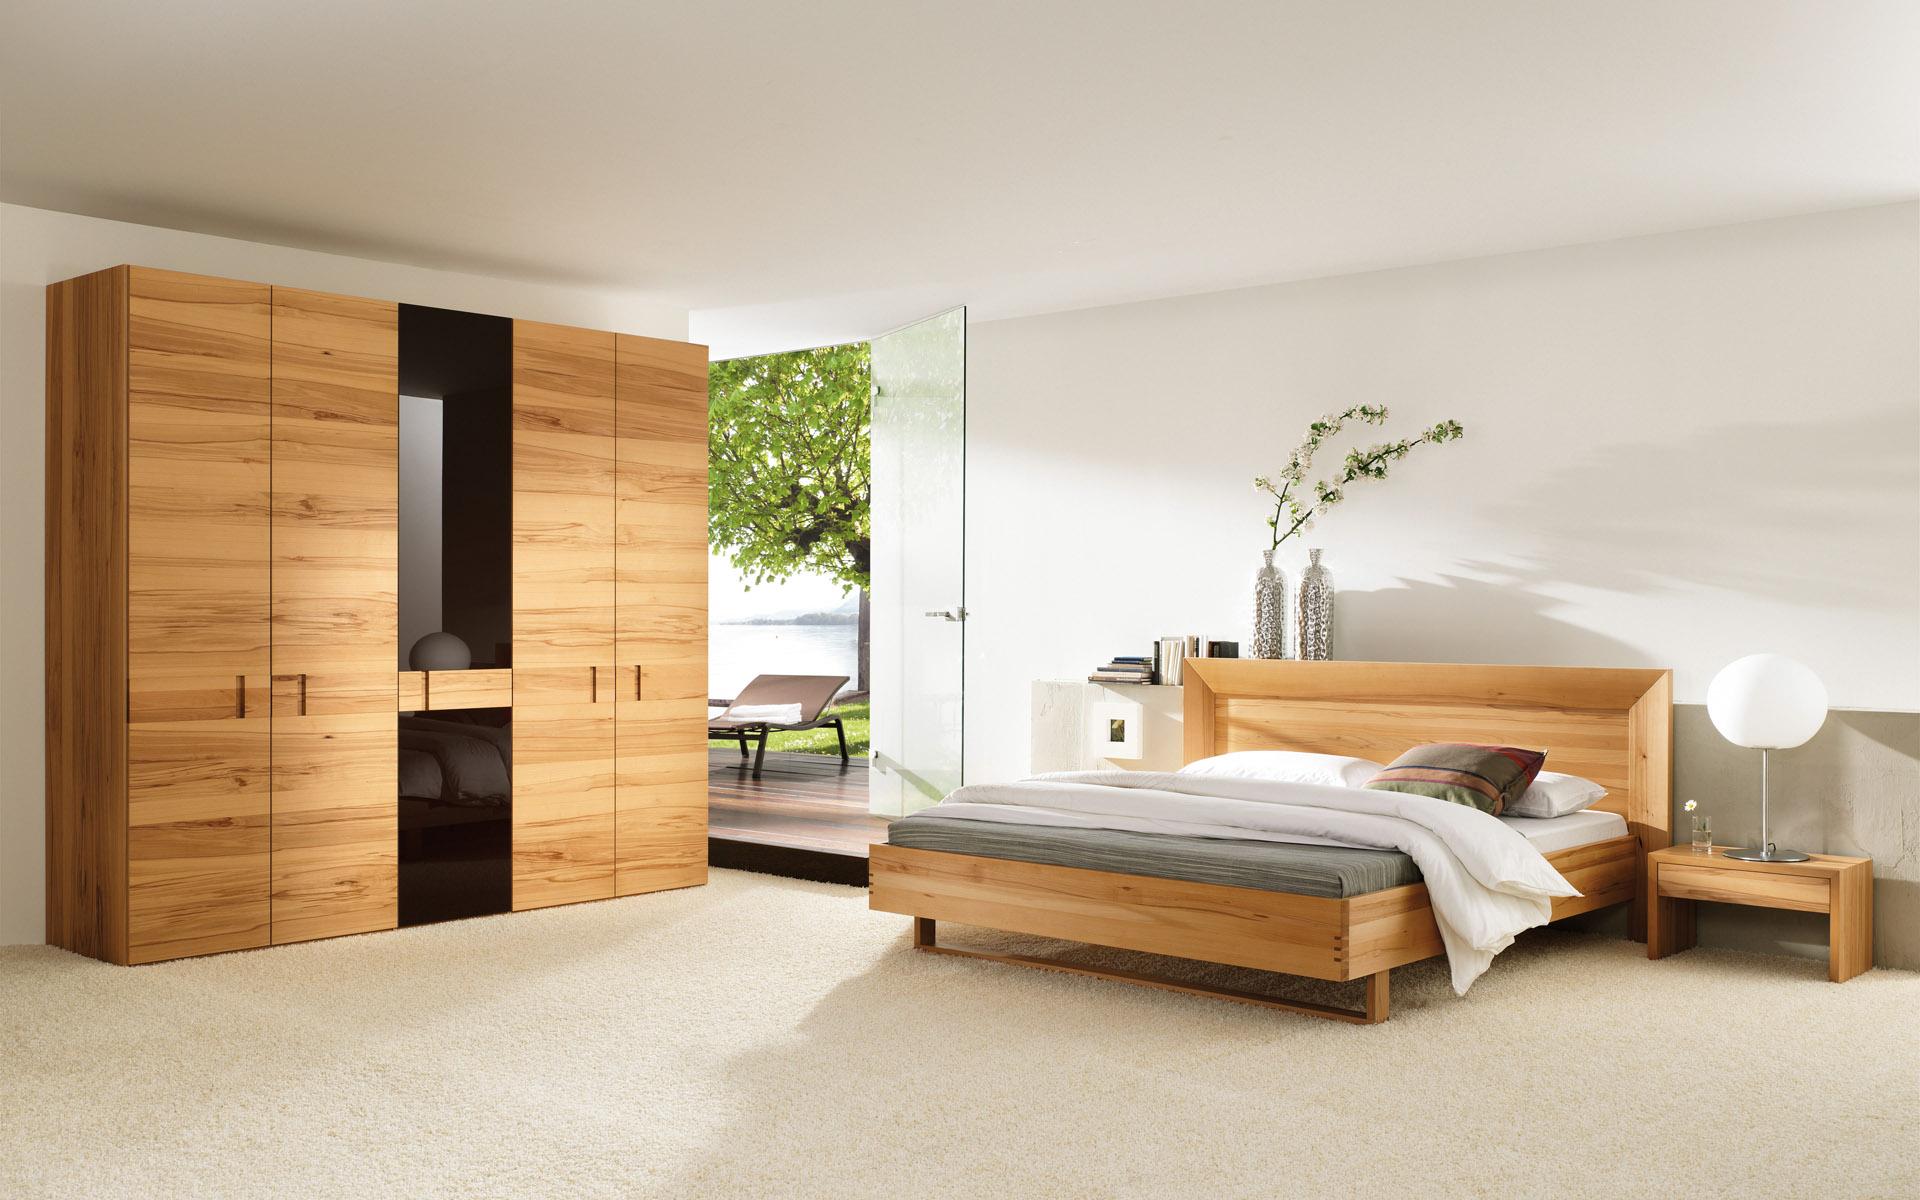 home-decoration376 clean bedroom decoration idea